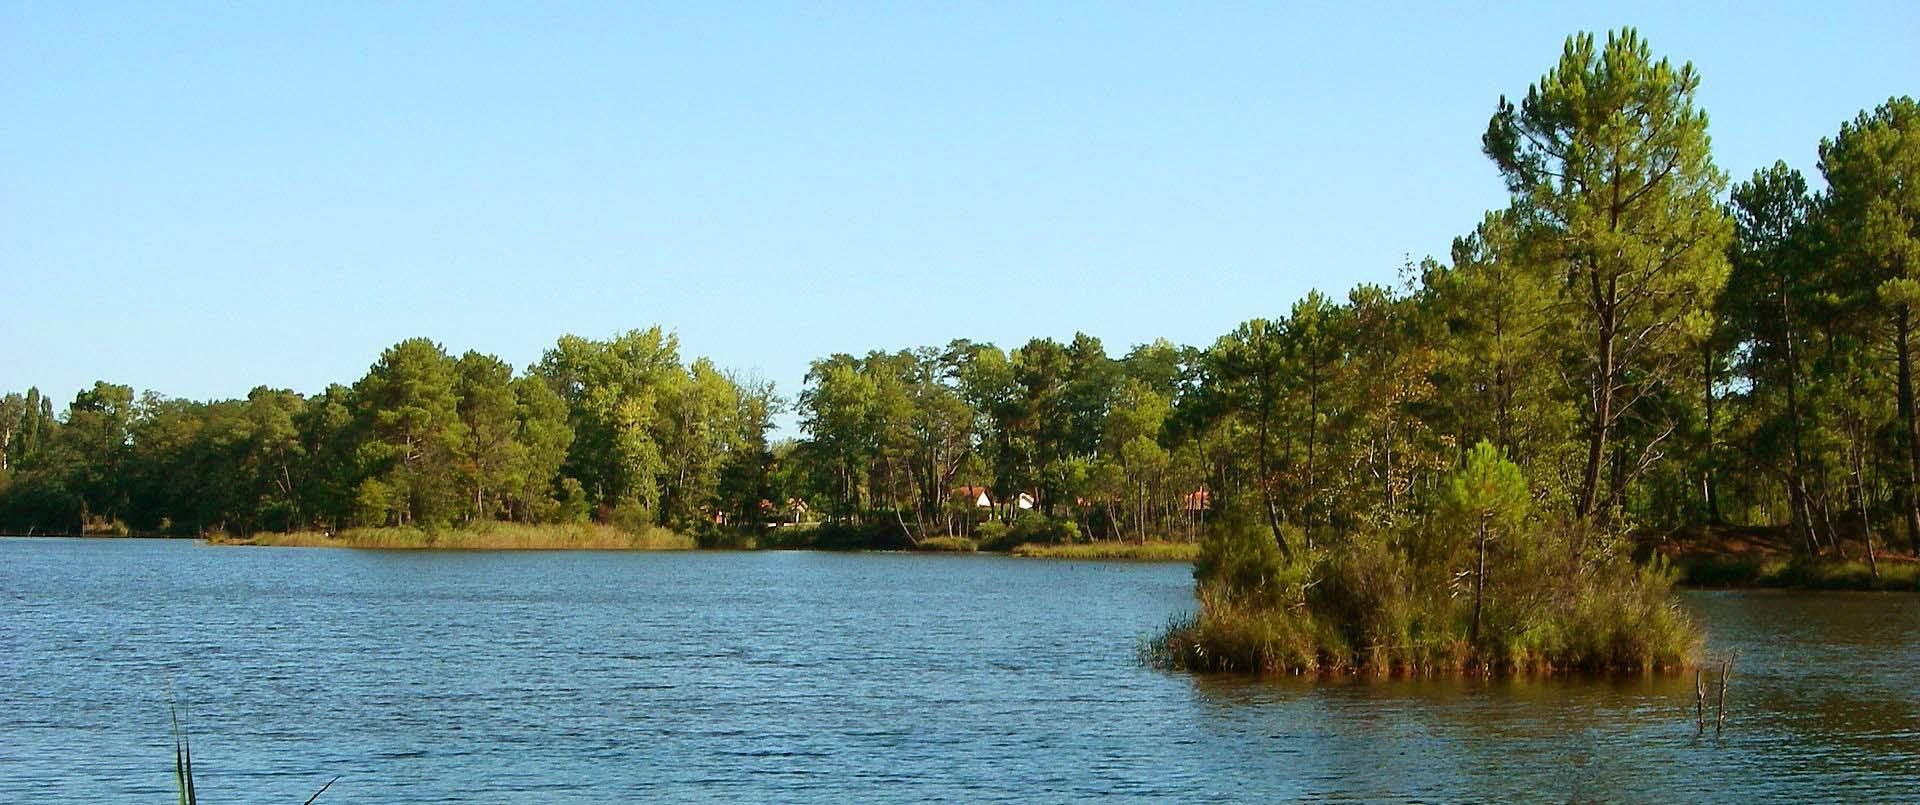 Lac Hostens